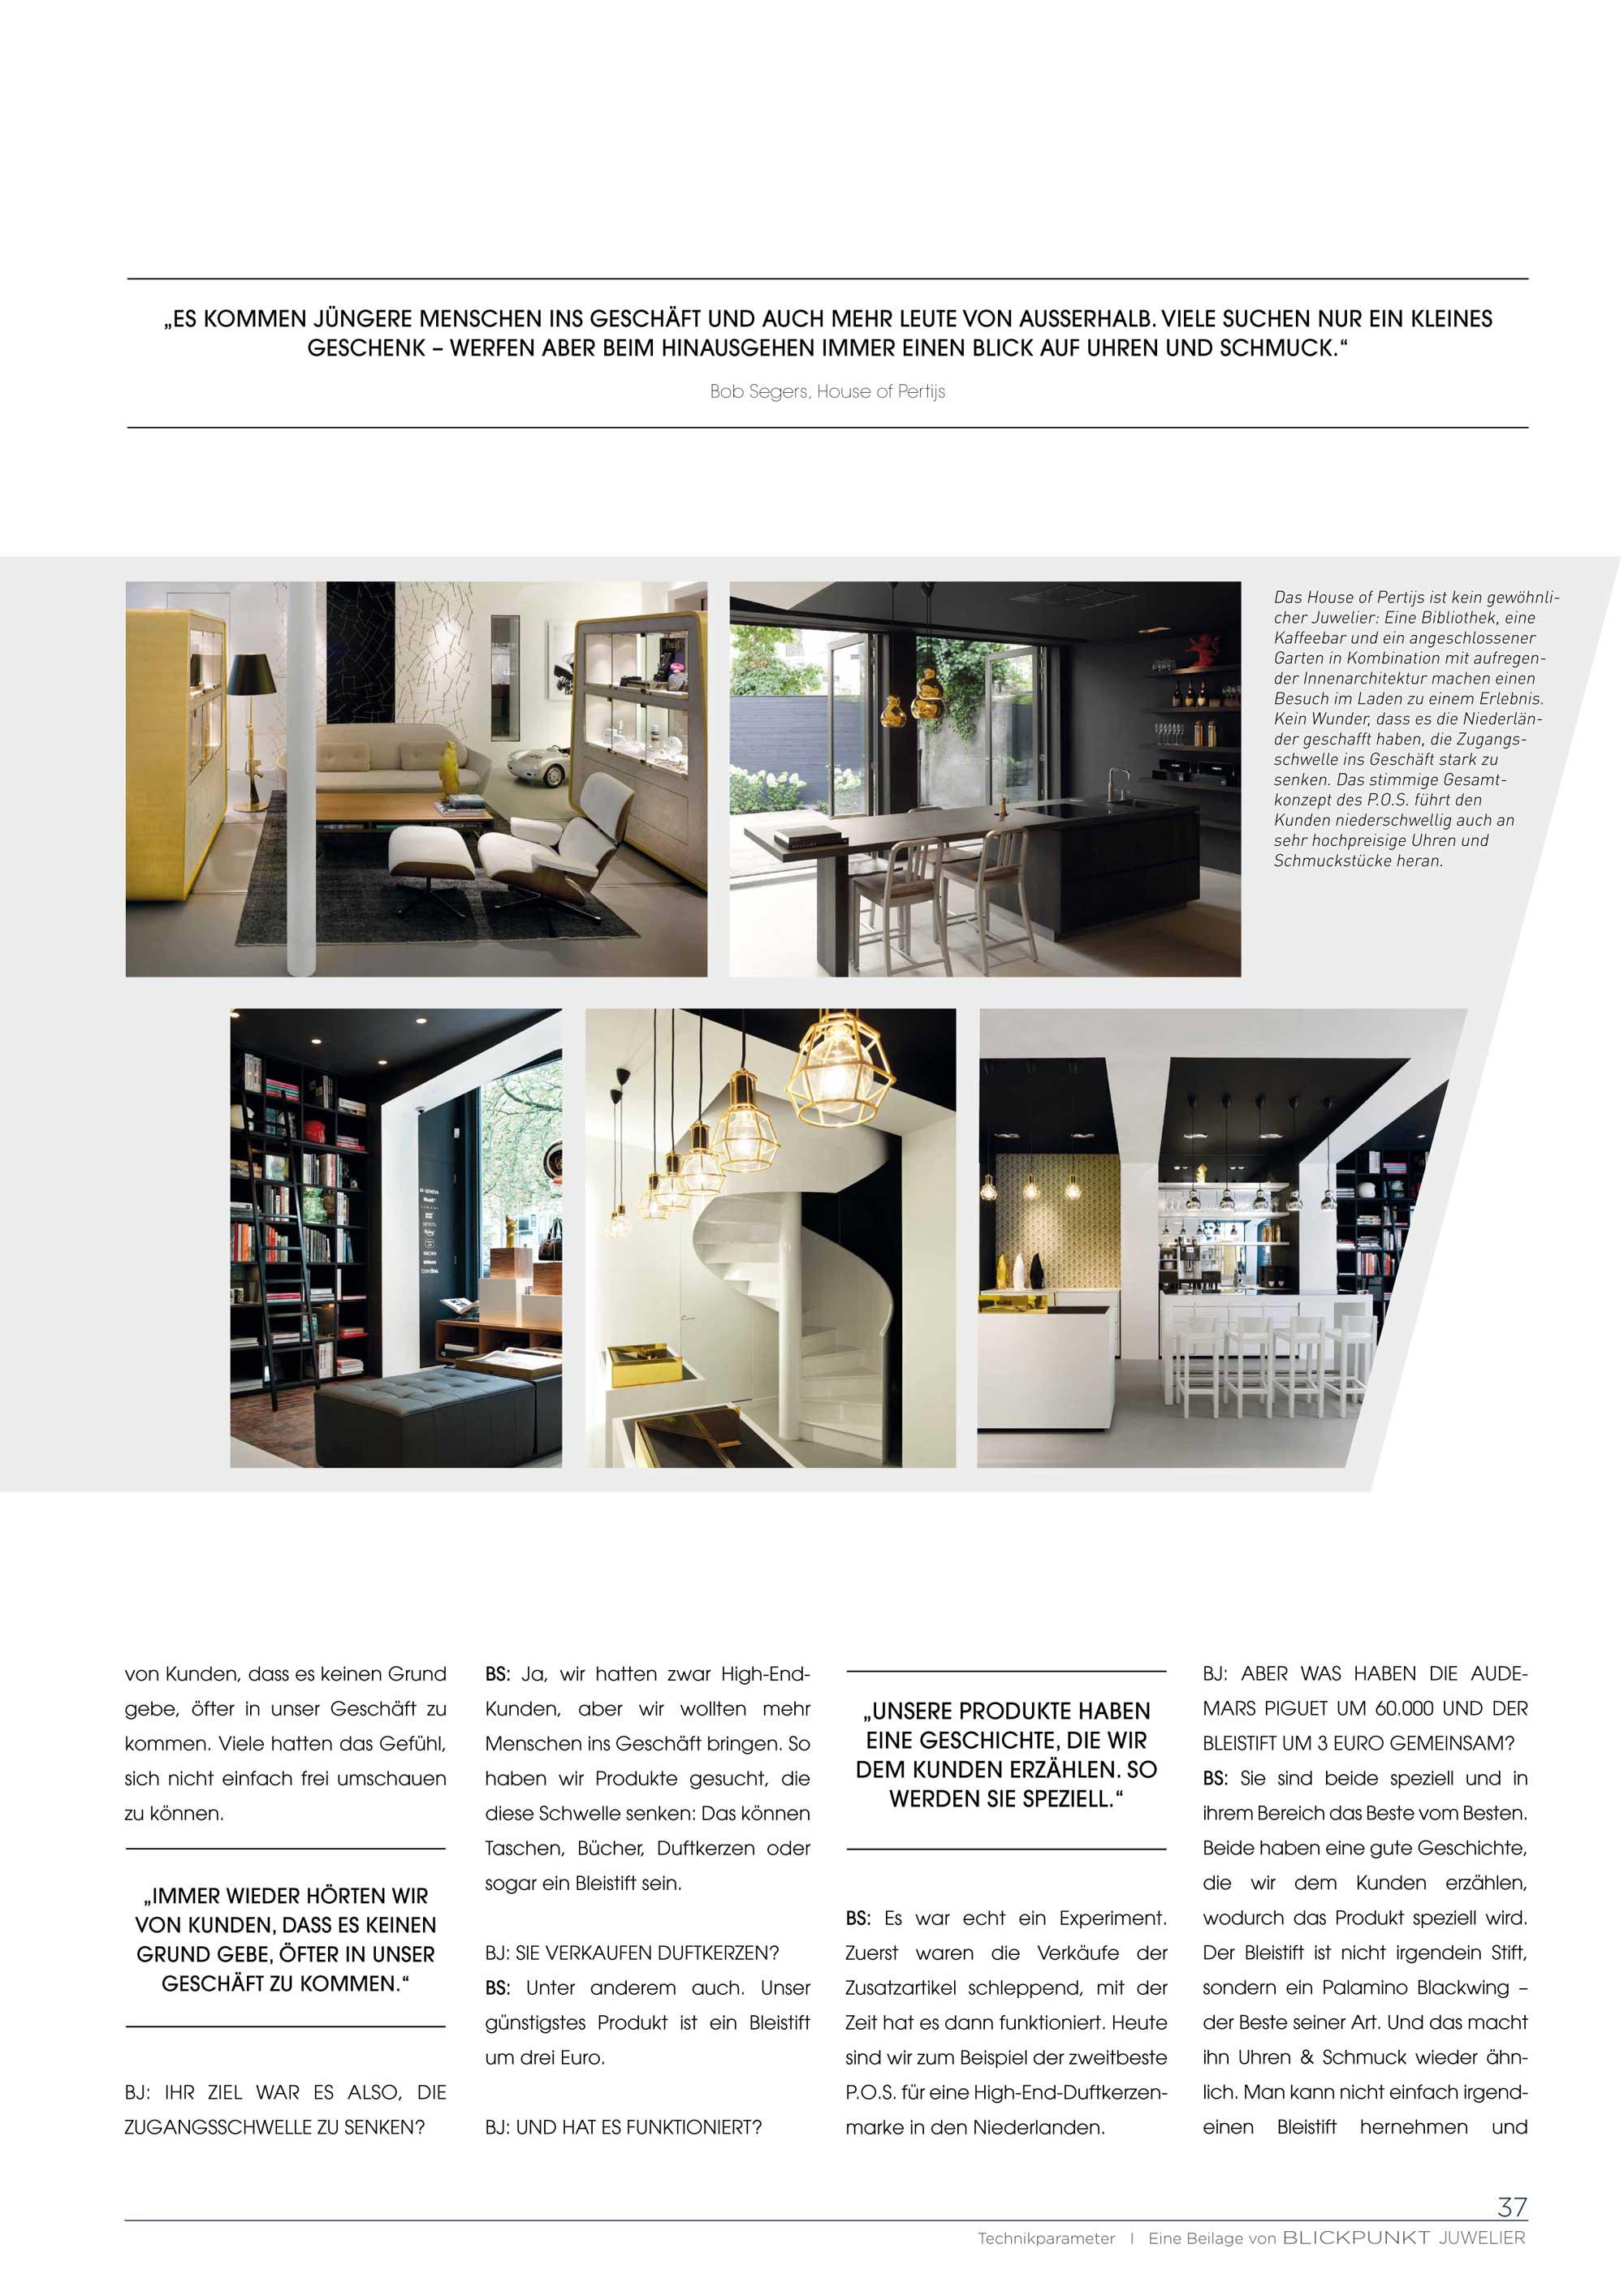 Artikel-Blickpunkt-Juwelier-2016-07-2